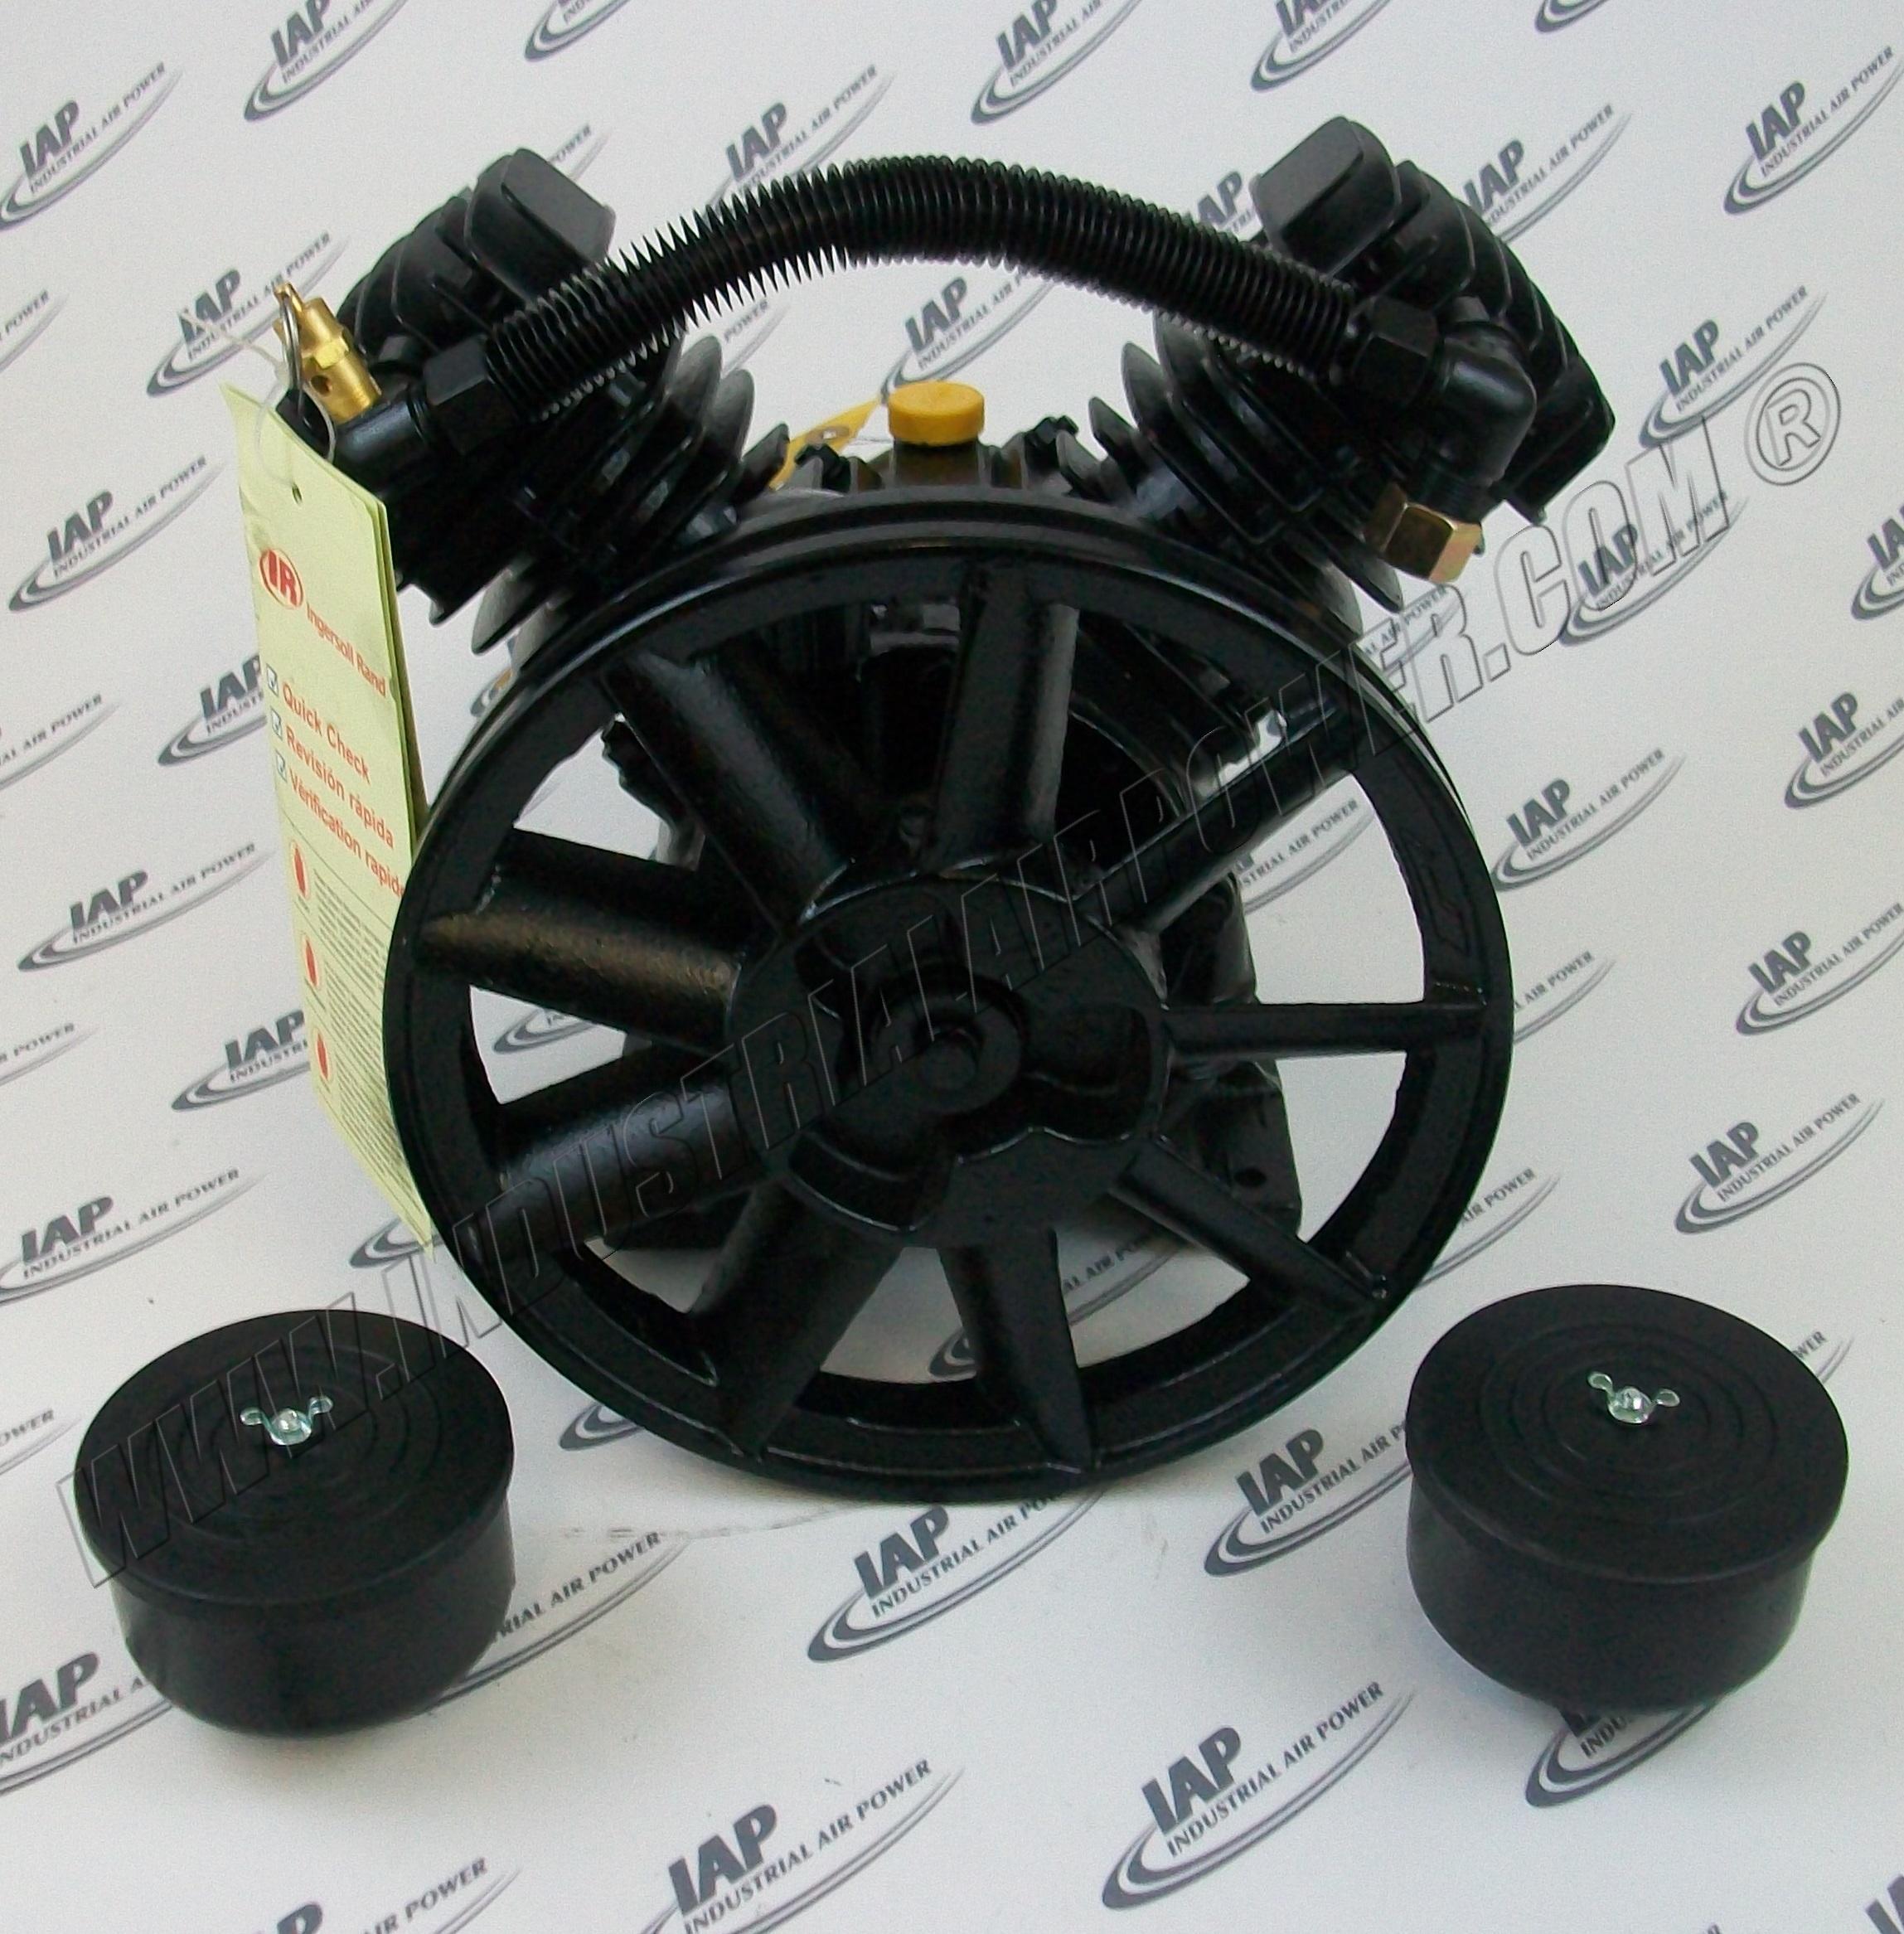 Ingersoll Rand 42660597 P1 5iu A9 Complete Pump